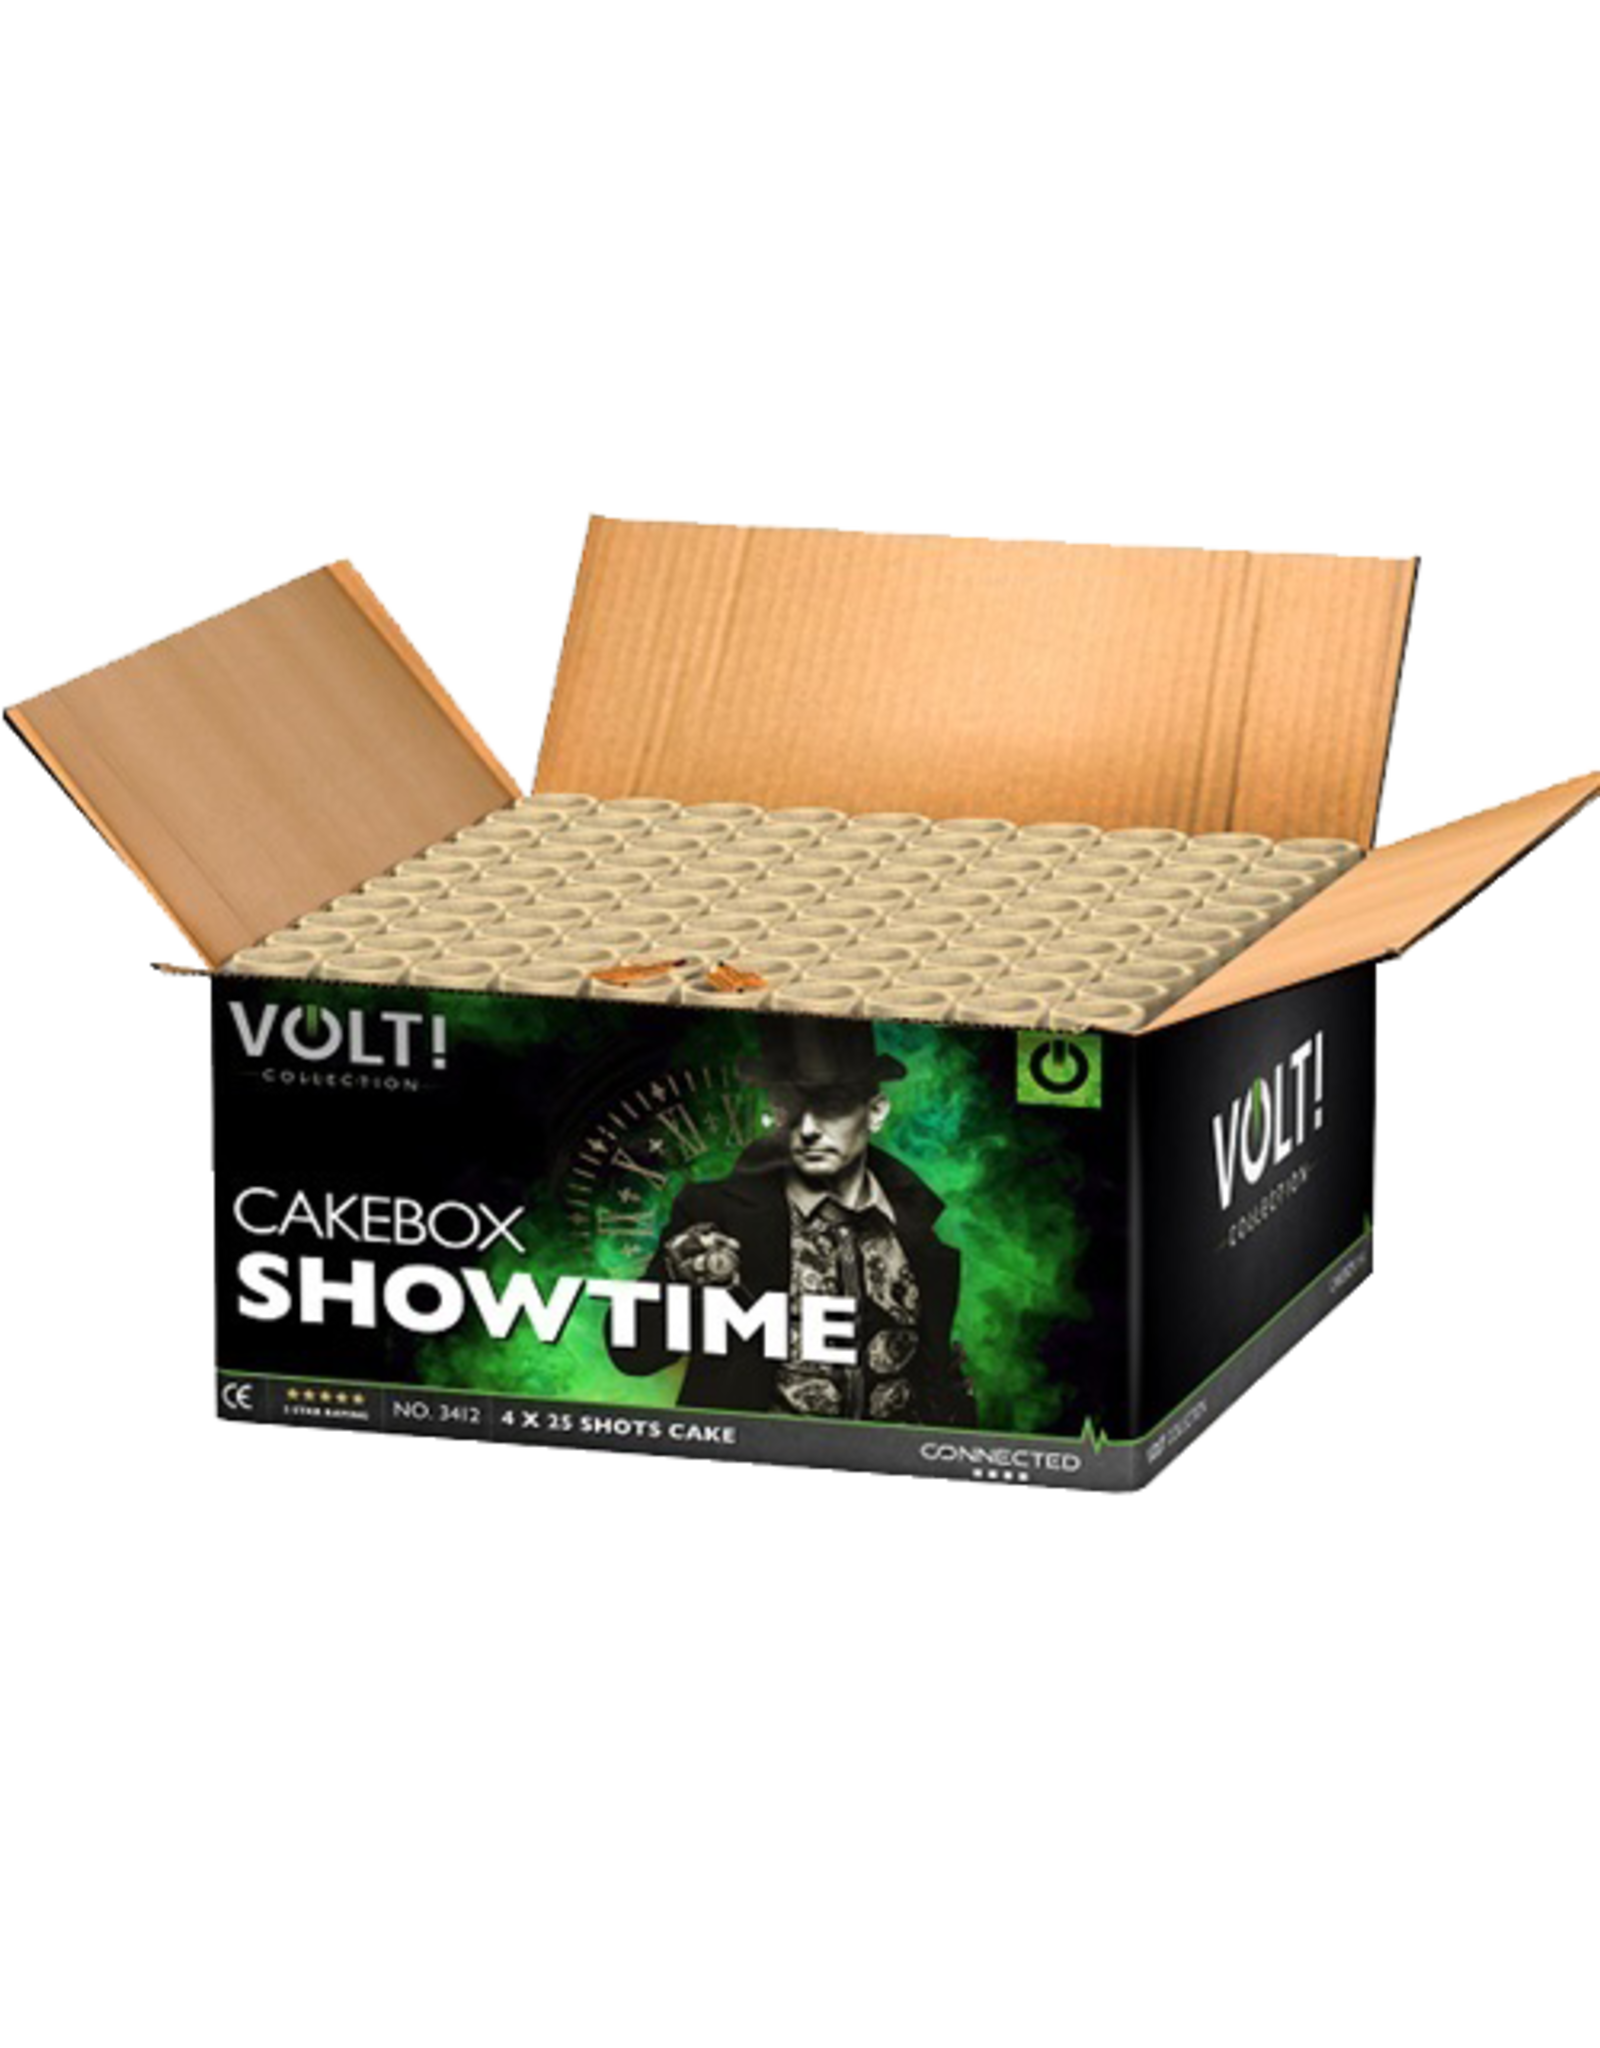 Volt! Showtime 100 shots